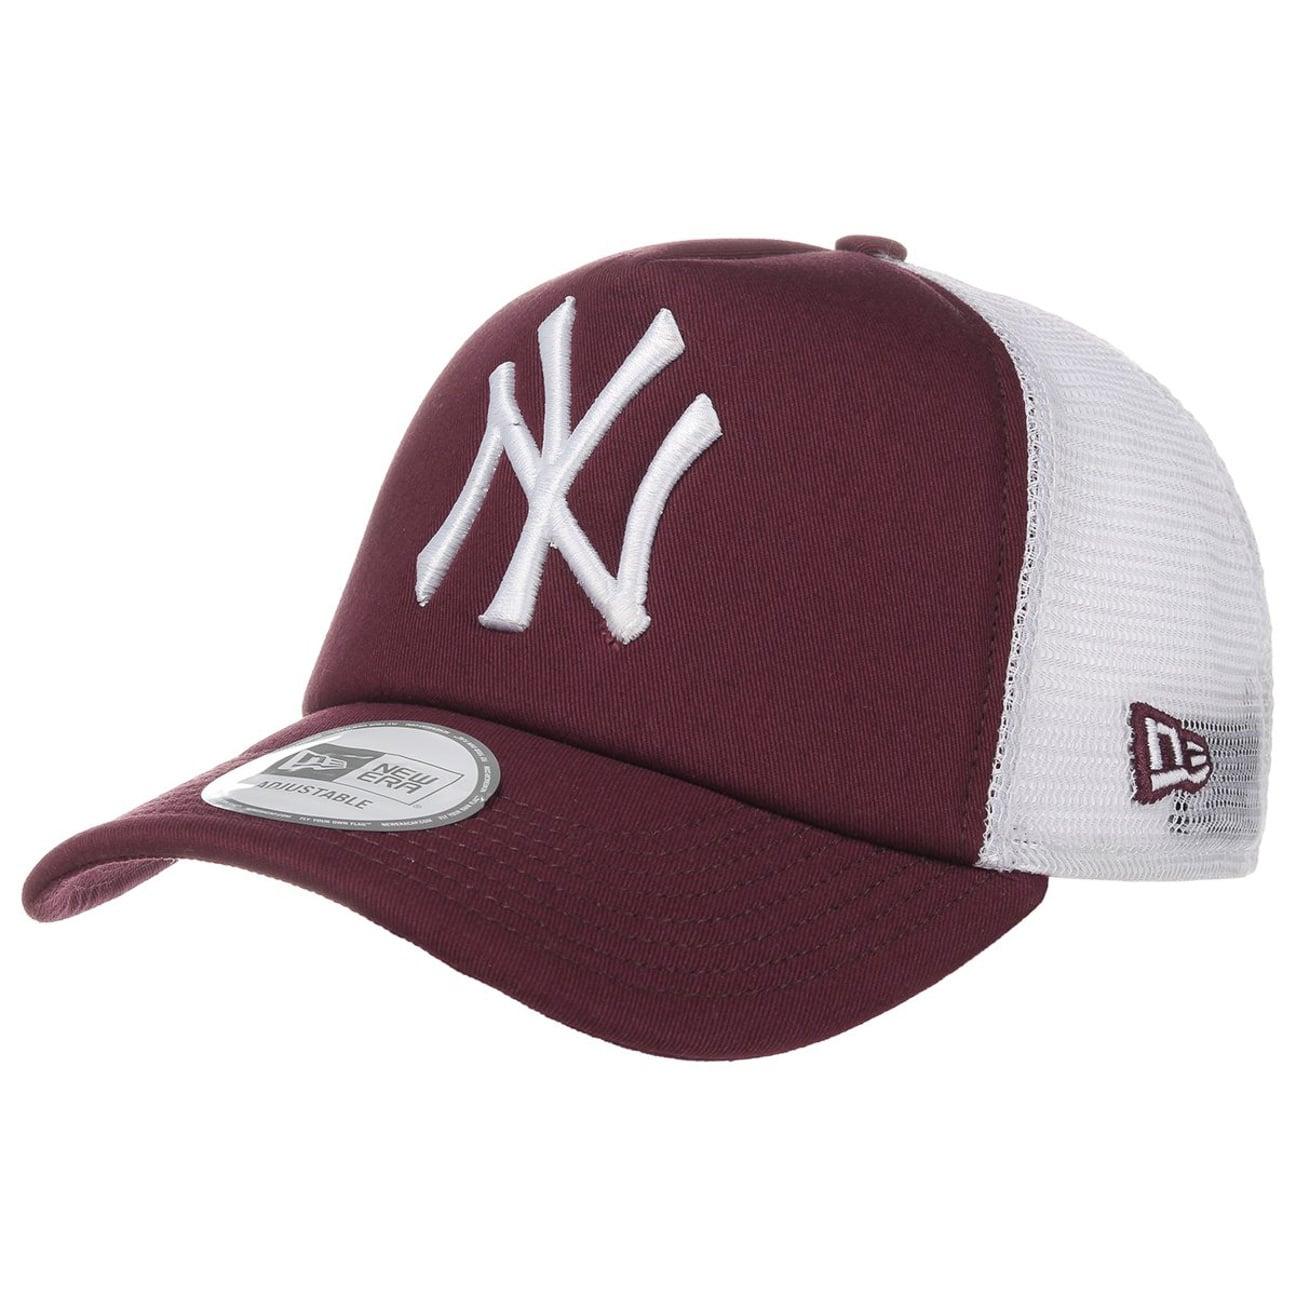 mlb clean trucker cap ny by new era gbp 25 95 hats. Black Bedroom Furniture Sets. Home Design Ideas